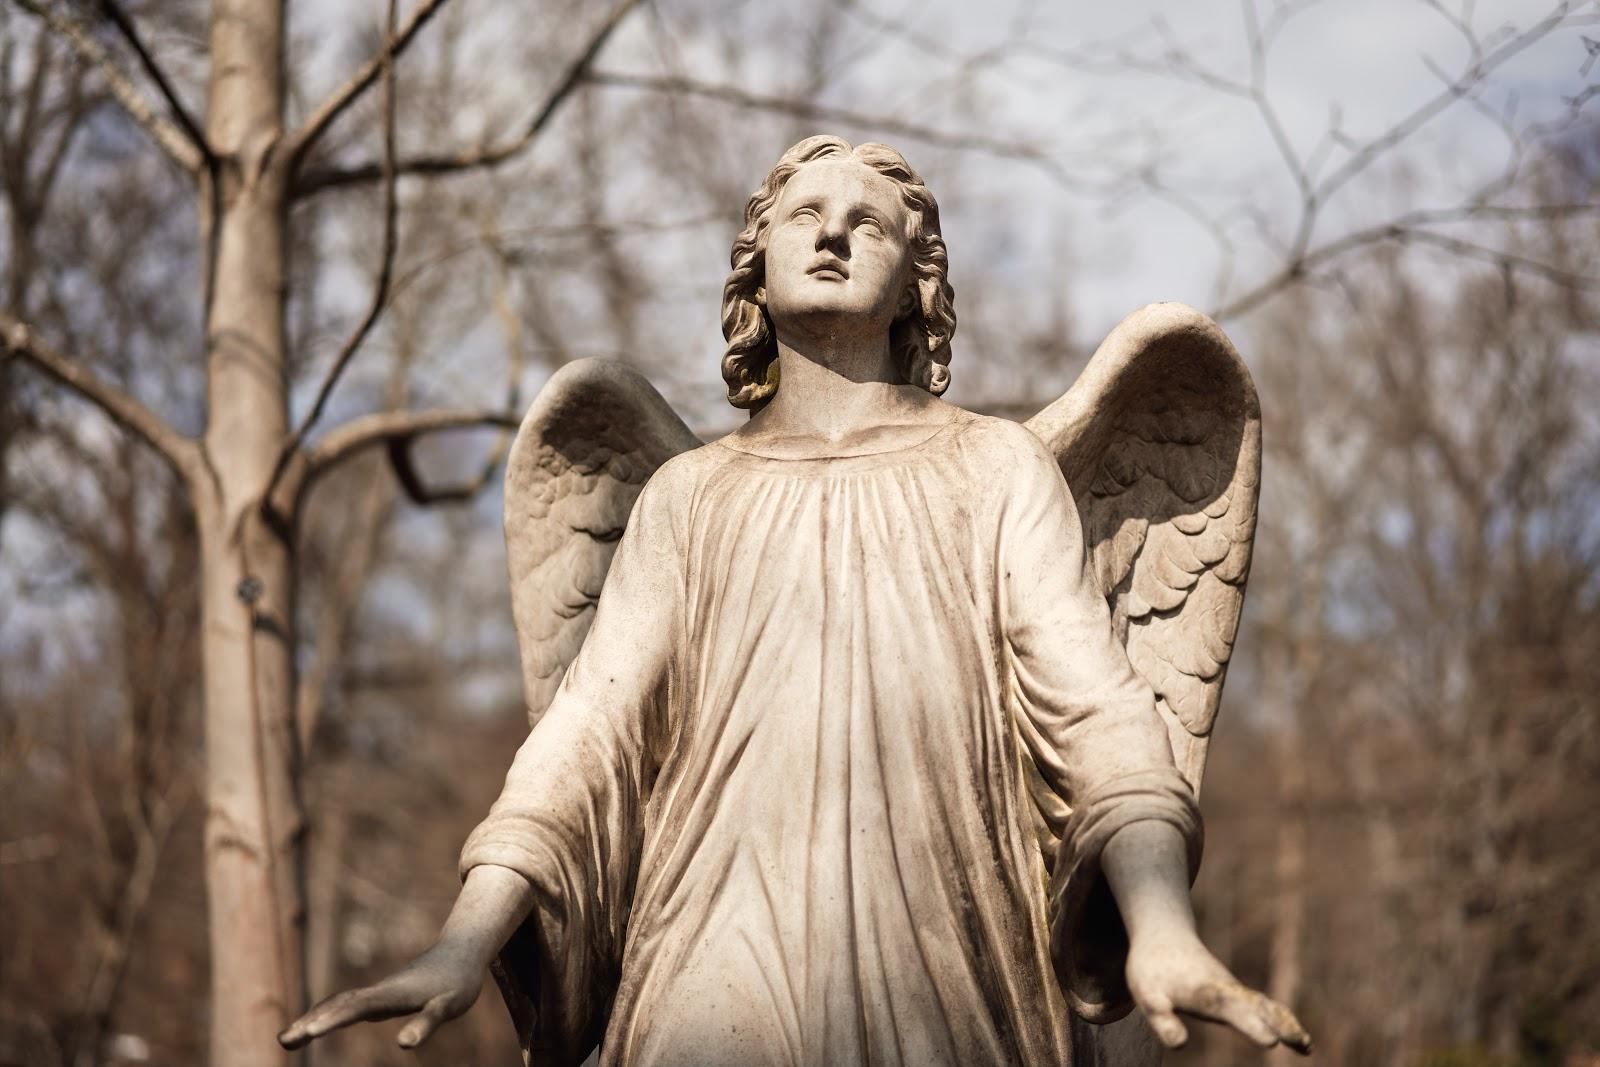 616 angel number (or beast number?)